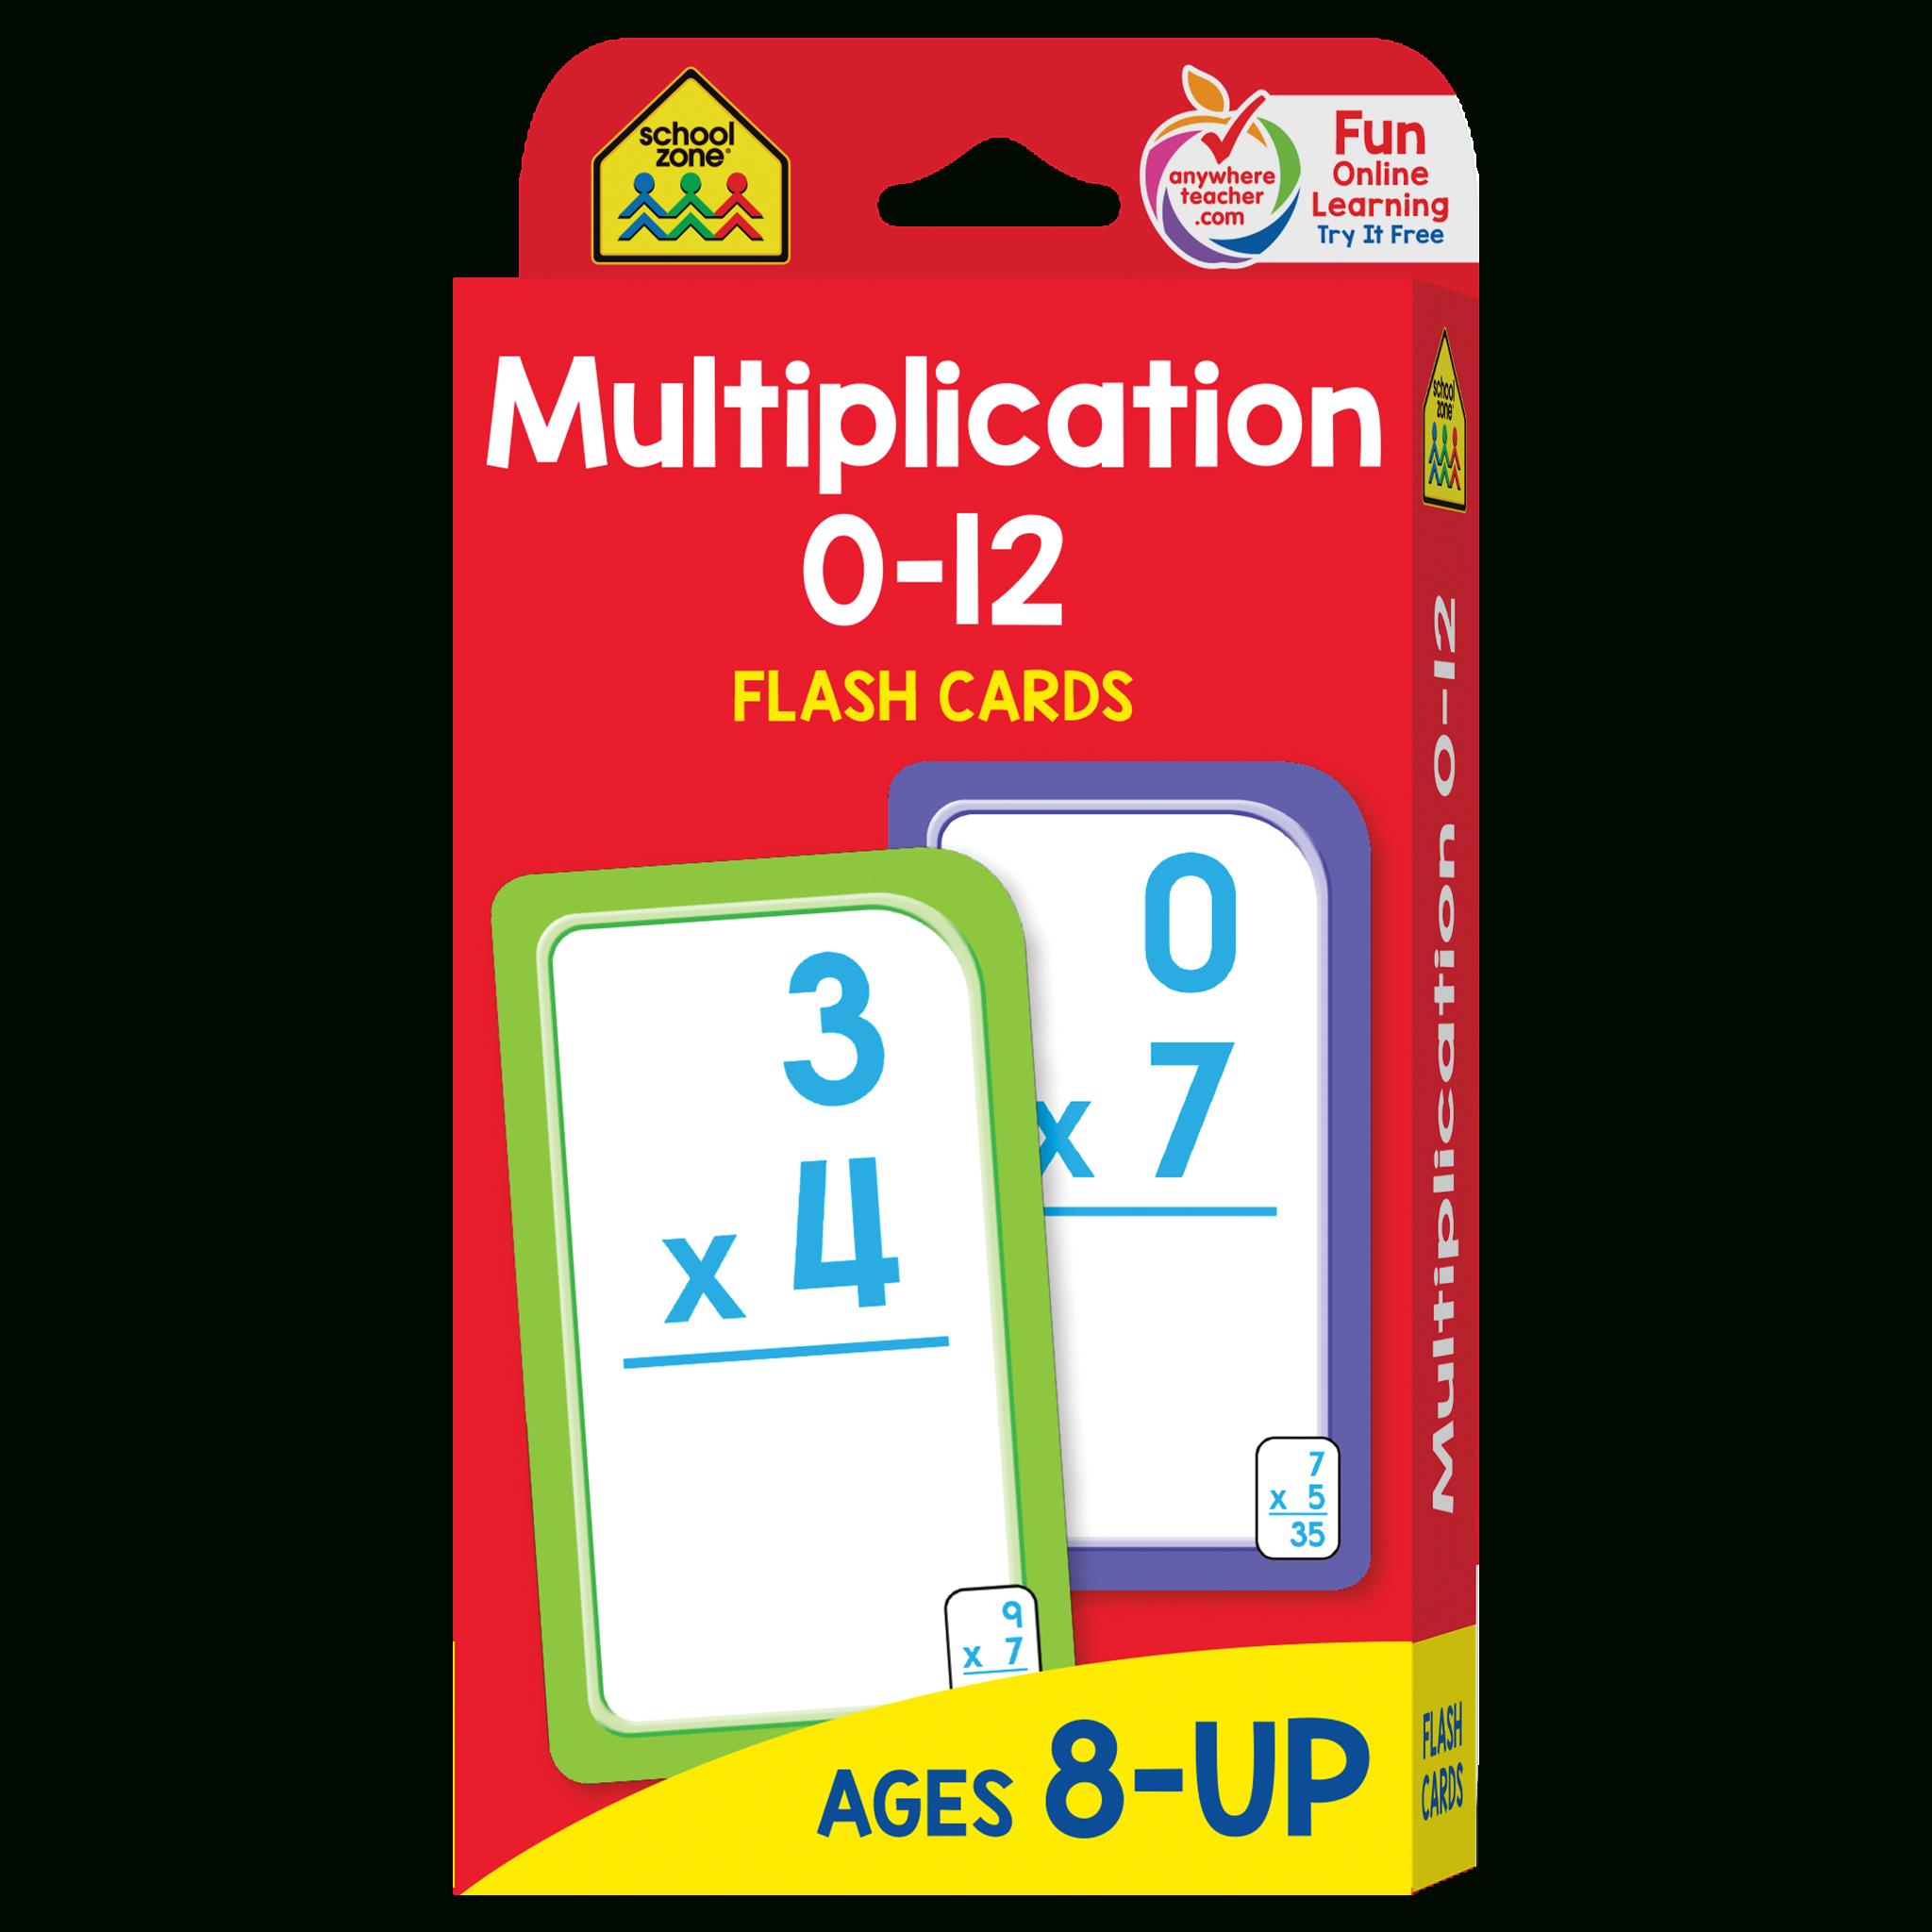 Multiplication 0-12 Flash Cards